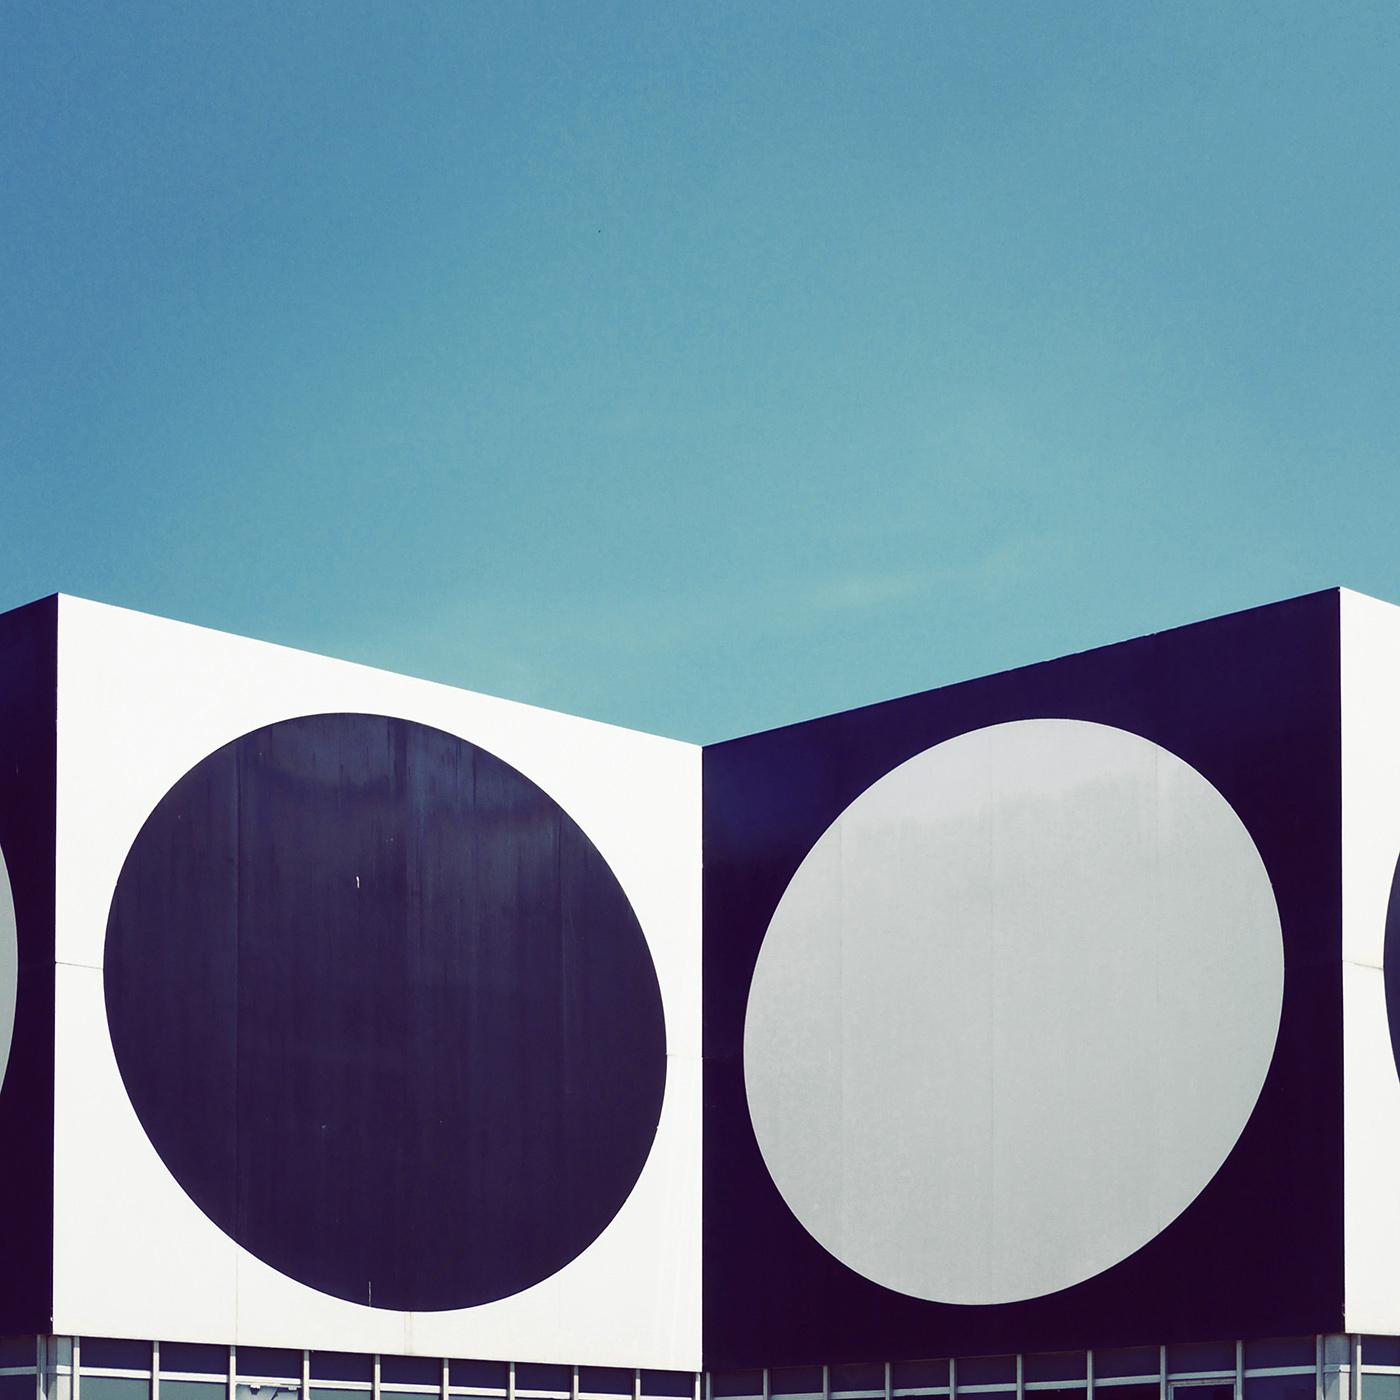 Fondation Vasarely <br />Location: Aix en Provence, France <br />Architects: John Sonnier, Dominique Ronsseray